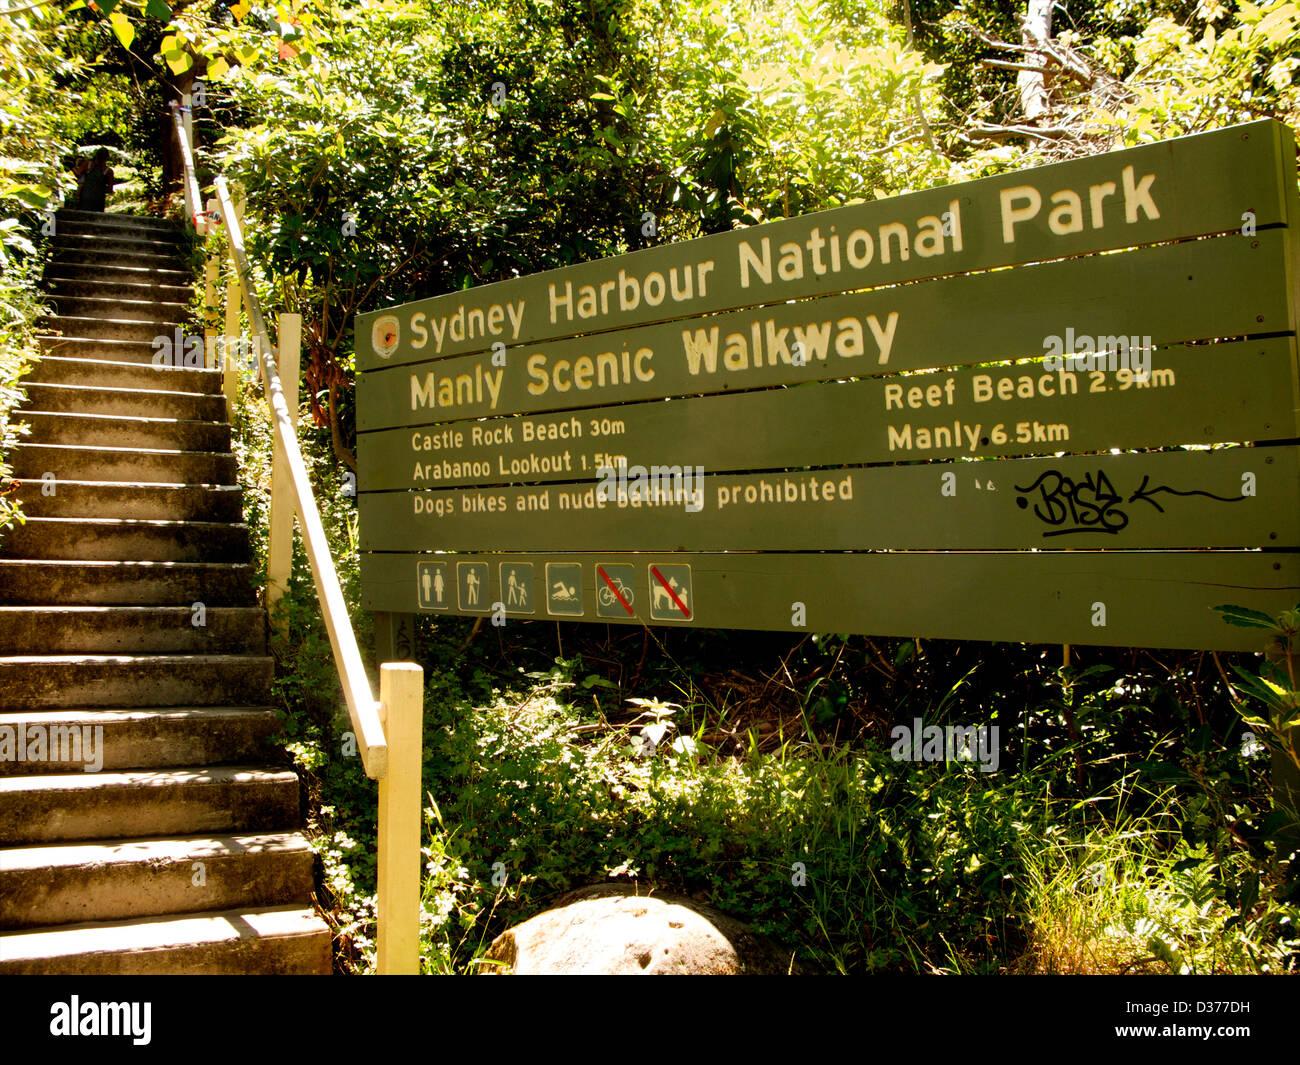 Steps on the Sydney Harbour National Park sign, Manly Scenic Walk Sydney Australia Stock Photo